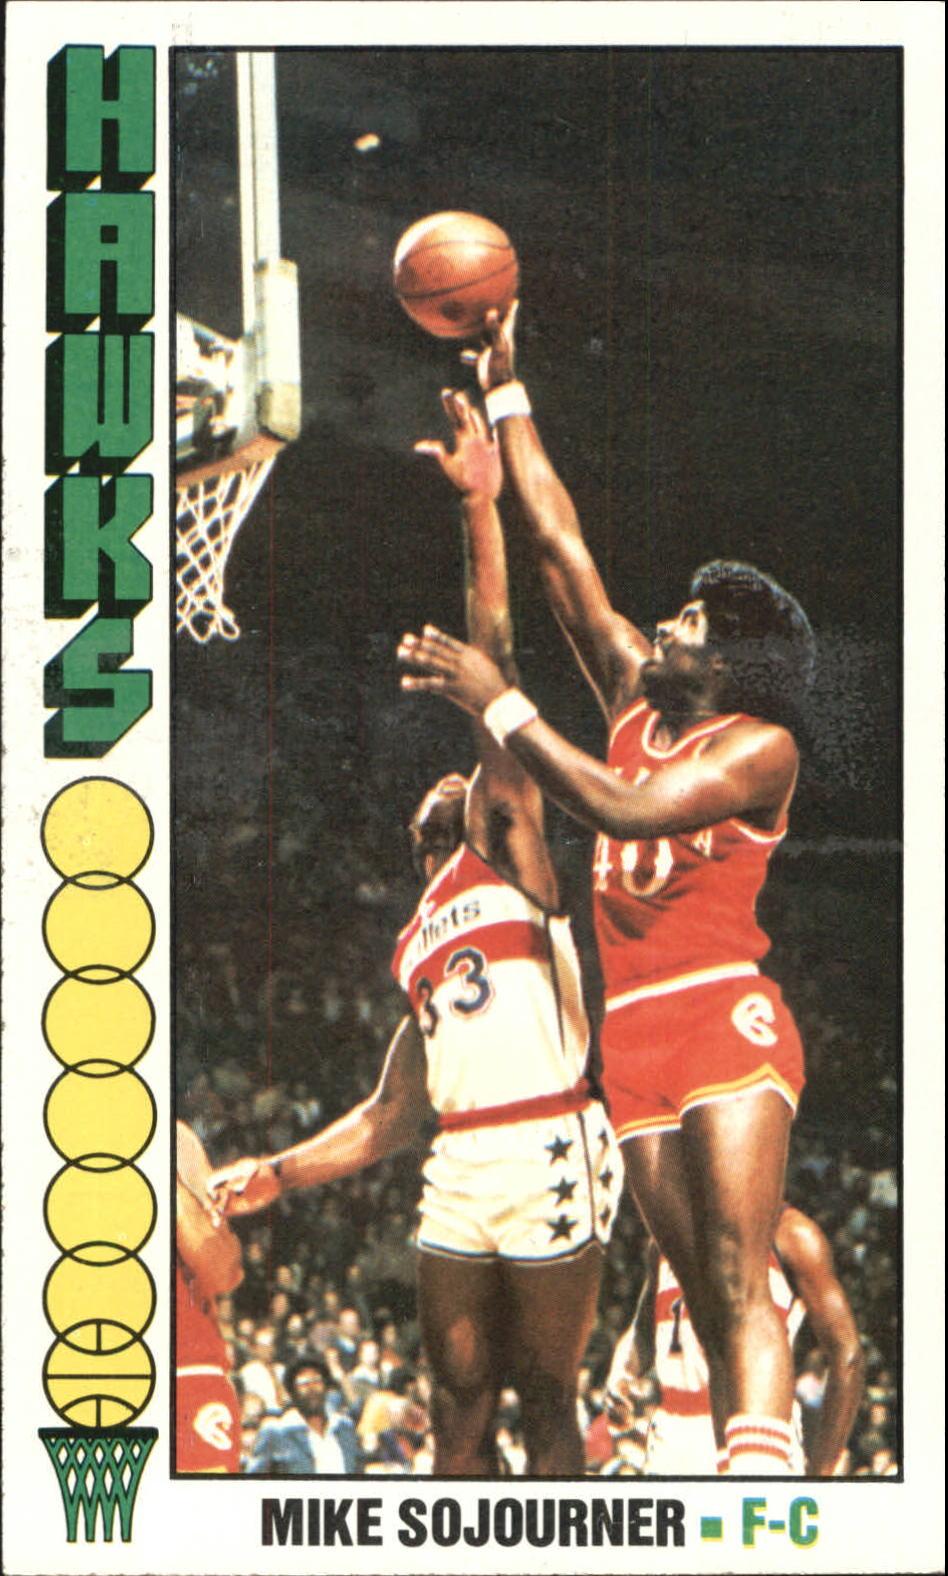 1976-77 Topps #79 Mike Sojourner